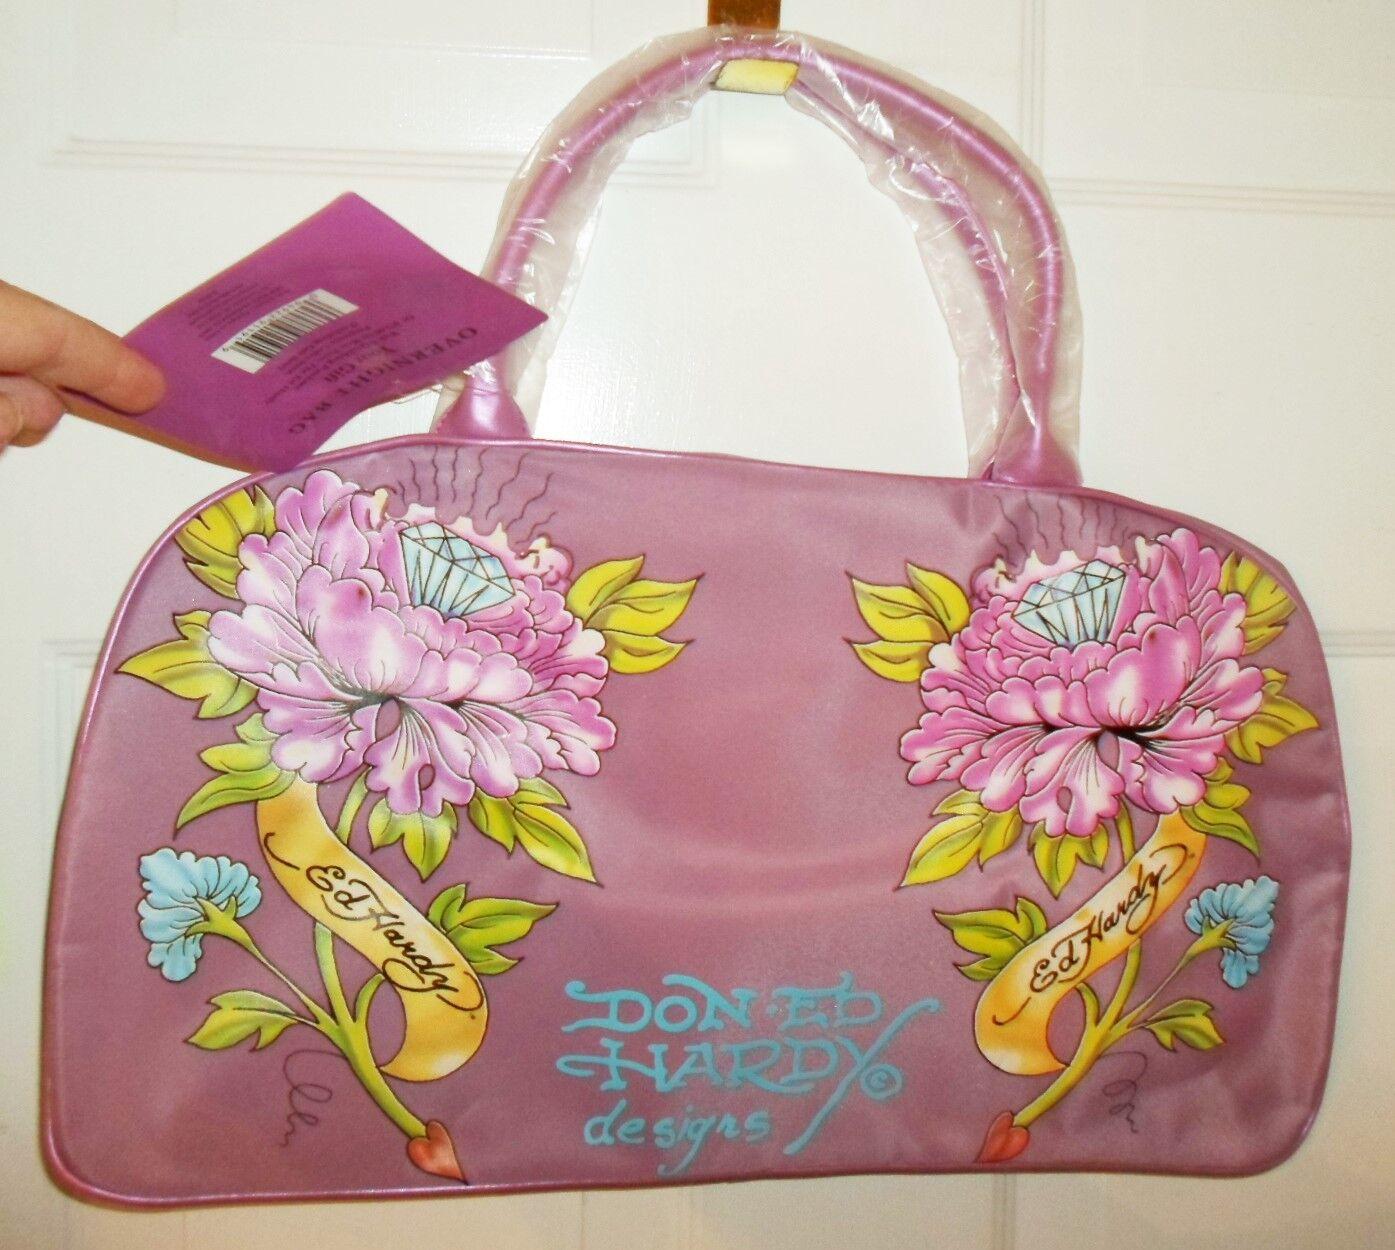 Ed Hardy Handbag Purple Flower Design By Christian Audigier